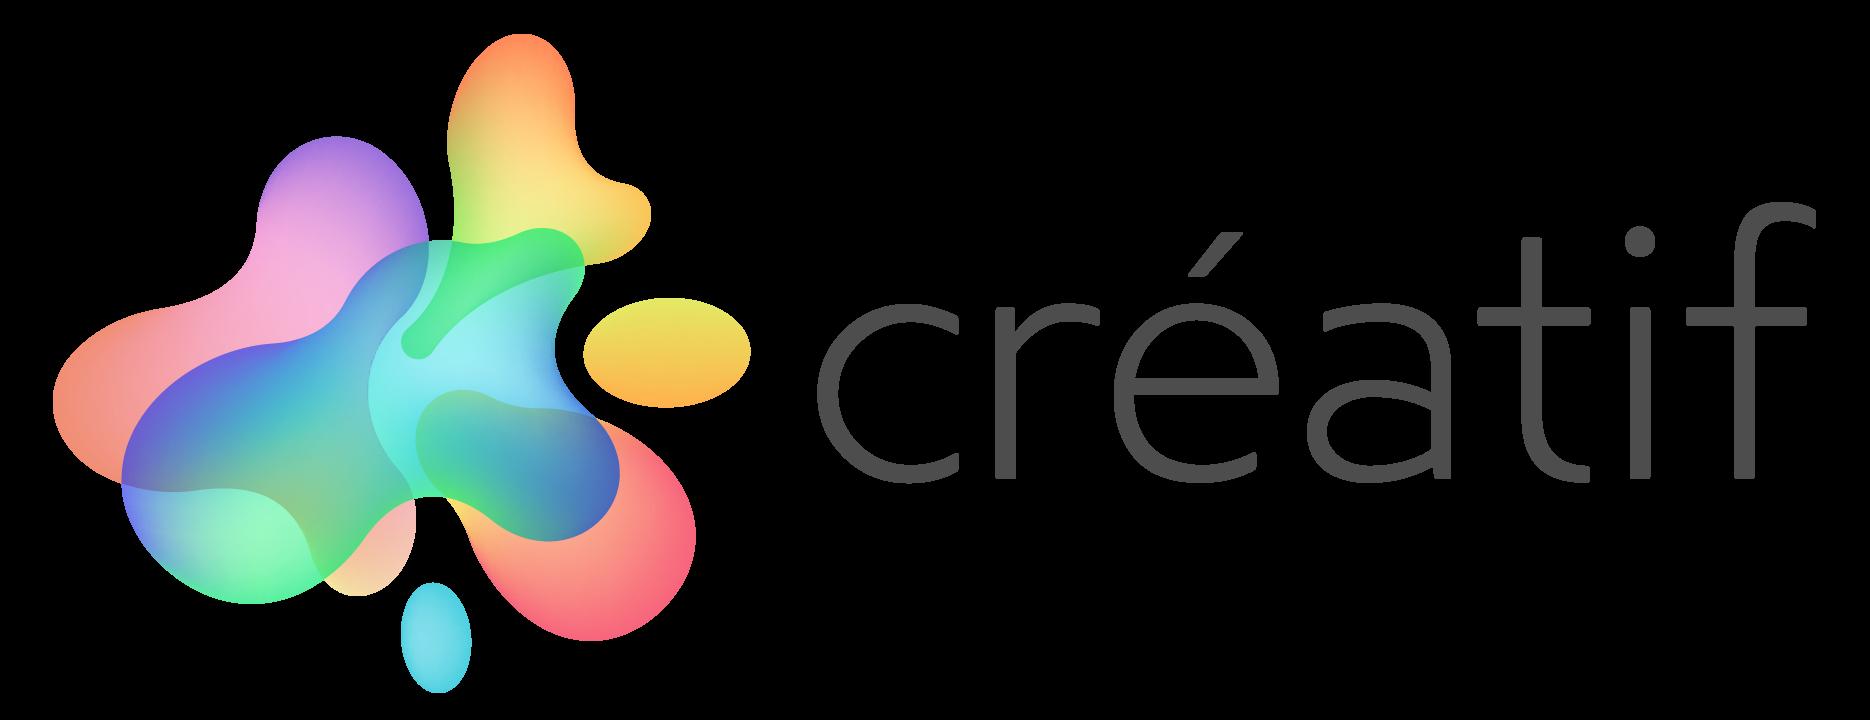 Creatif-Logo